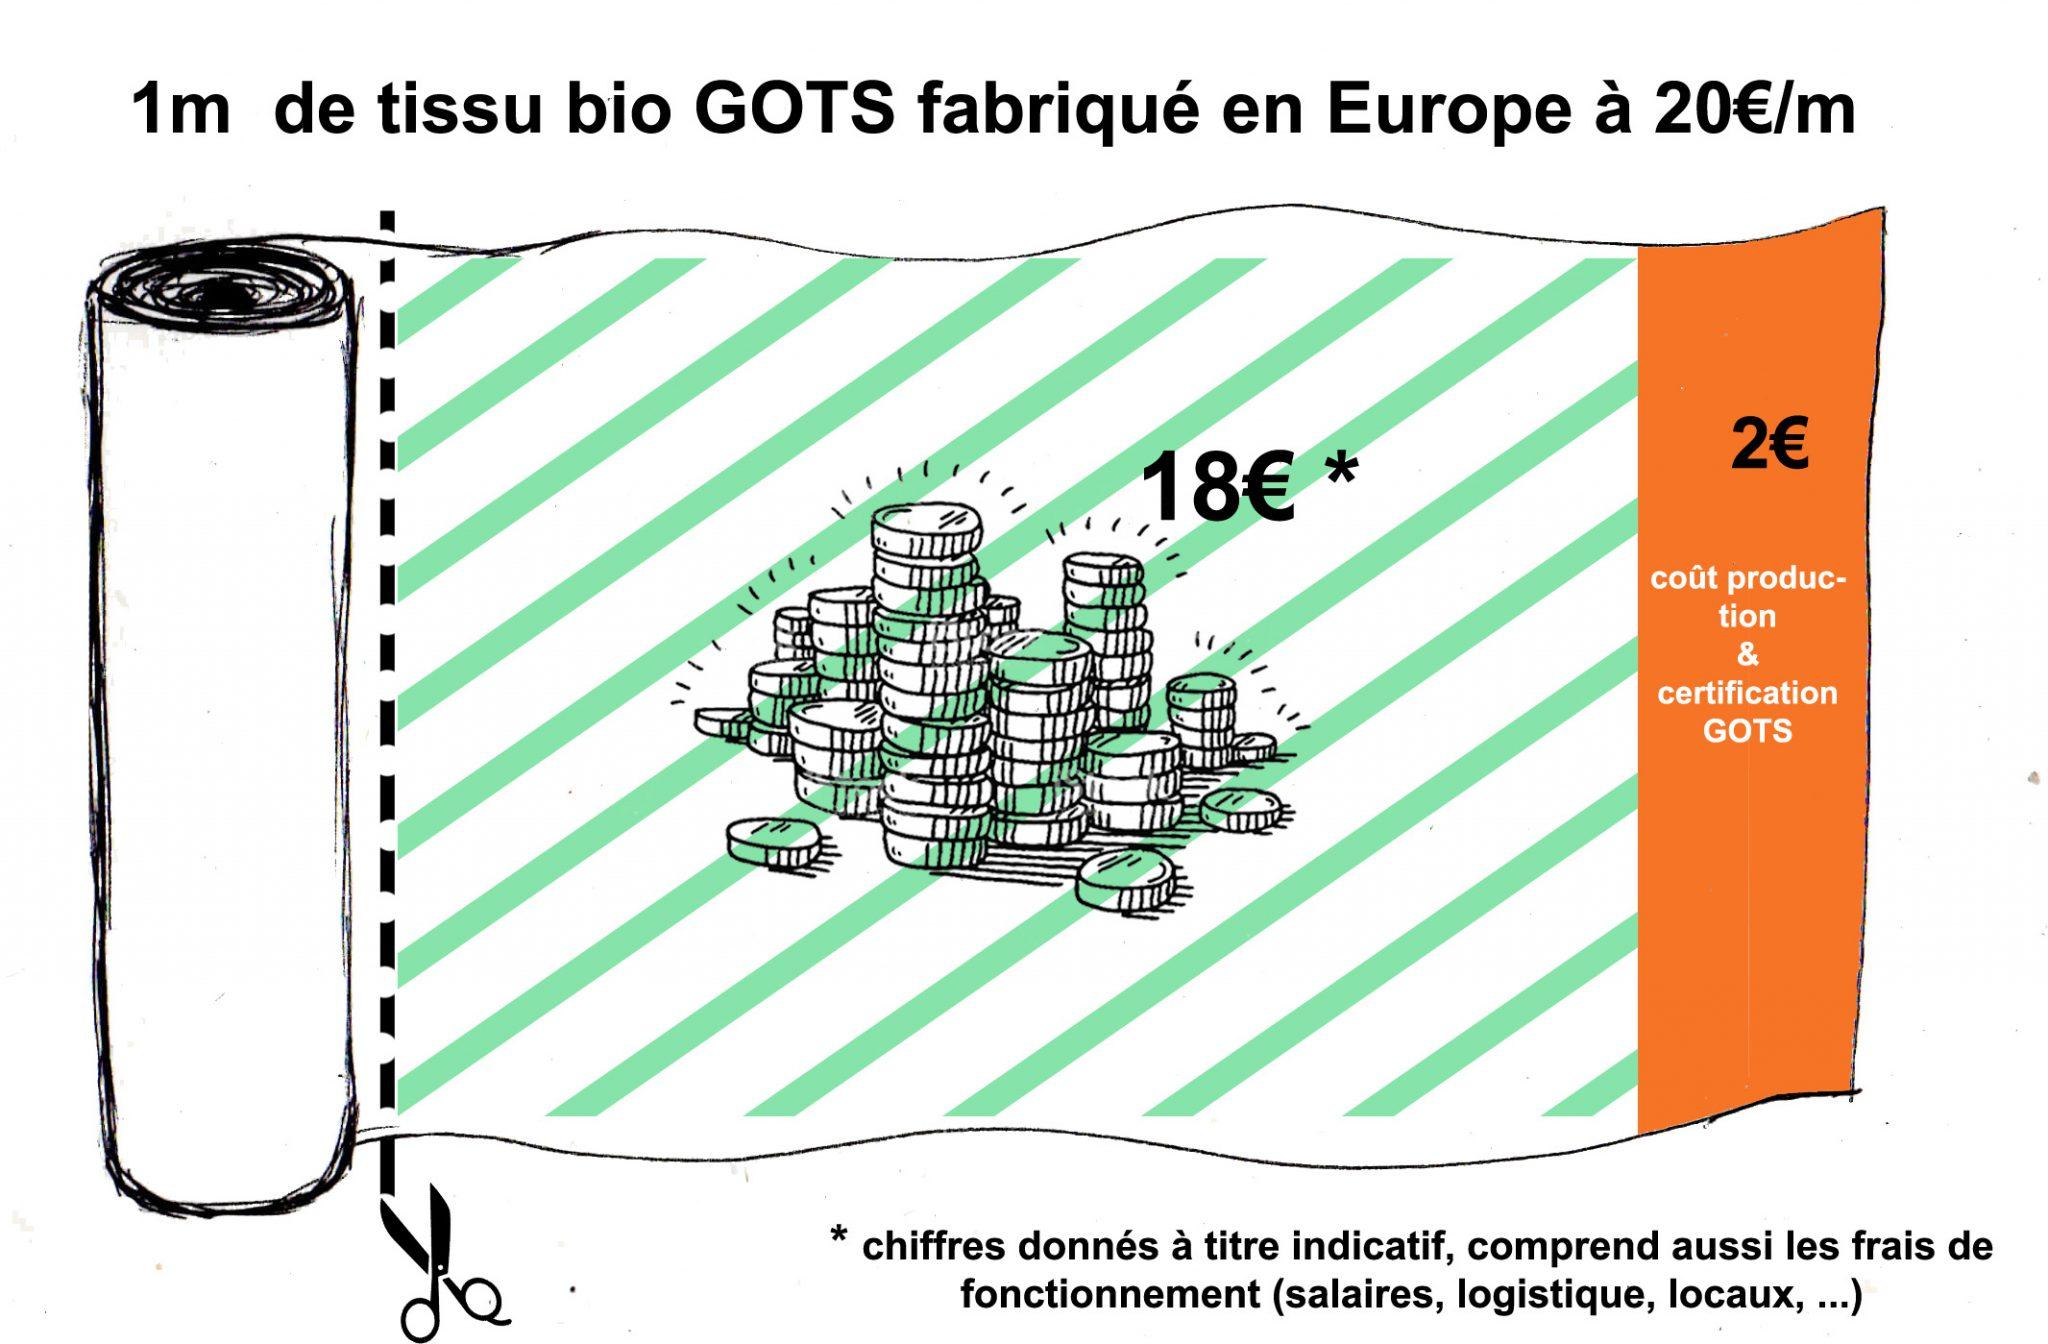 Coûts 1m de tissu - Europe